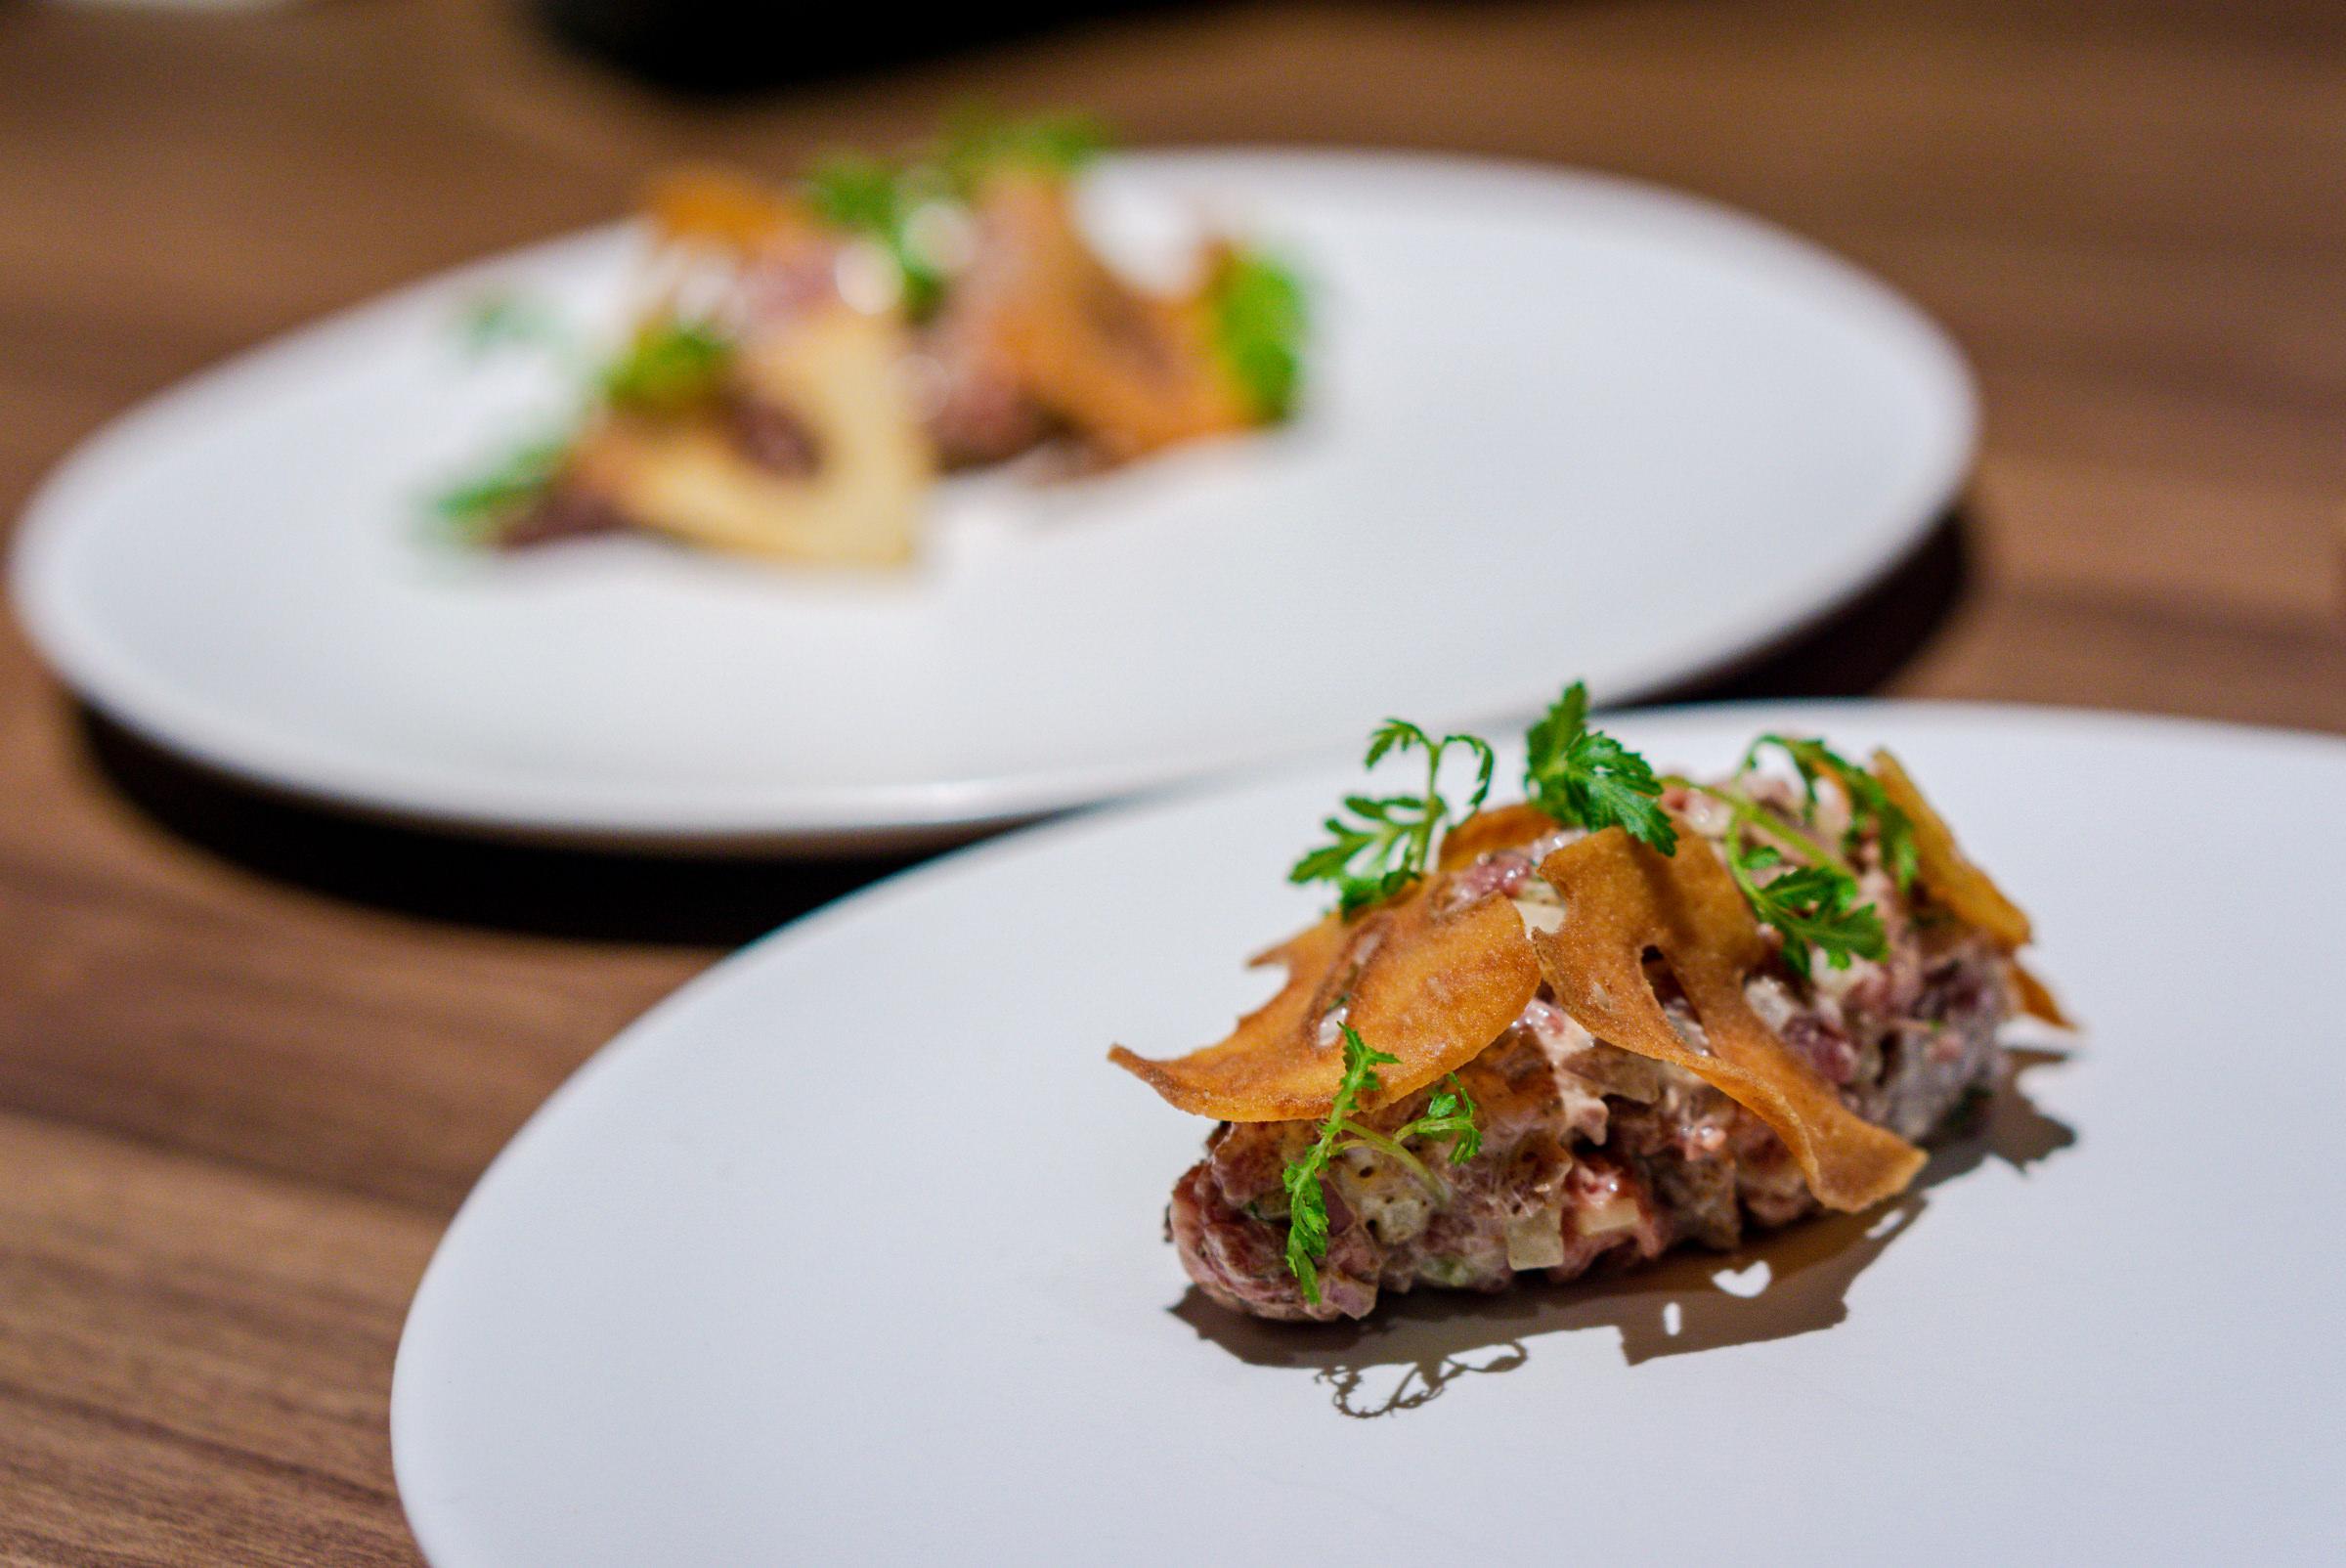 Restaurant Ibid, Woo Wai Leong - Lamb Tartare